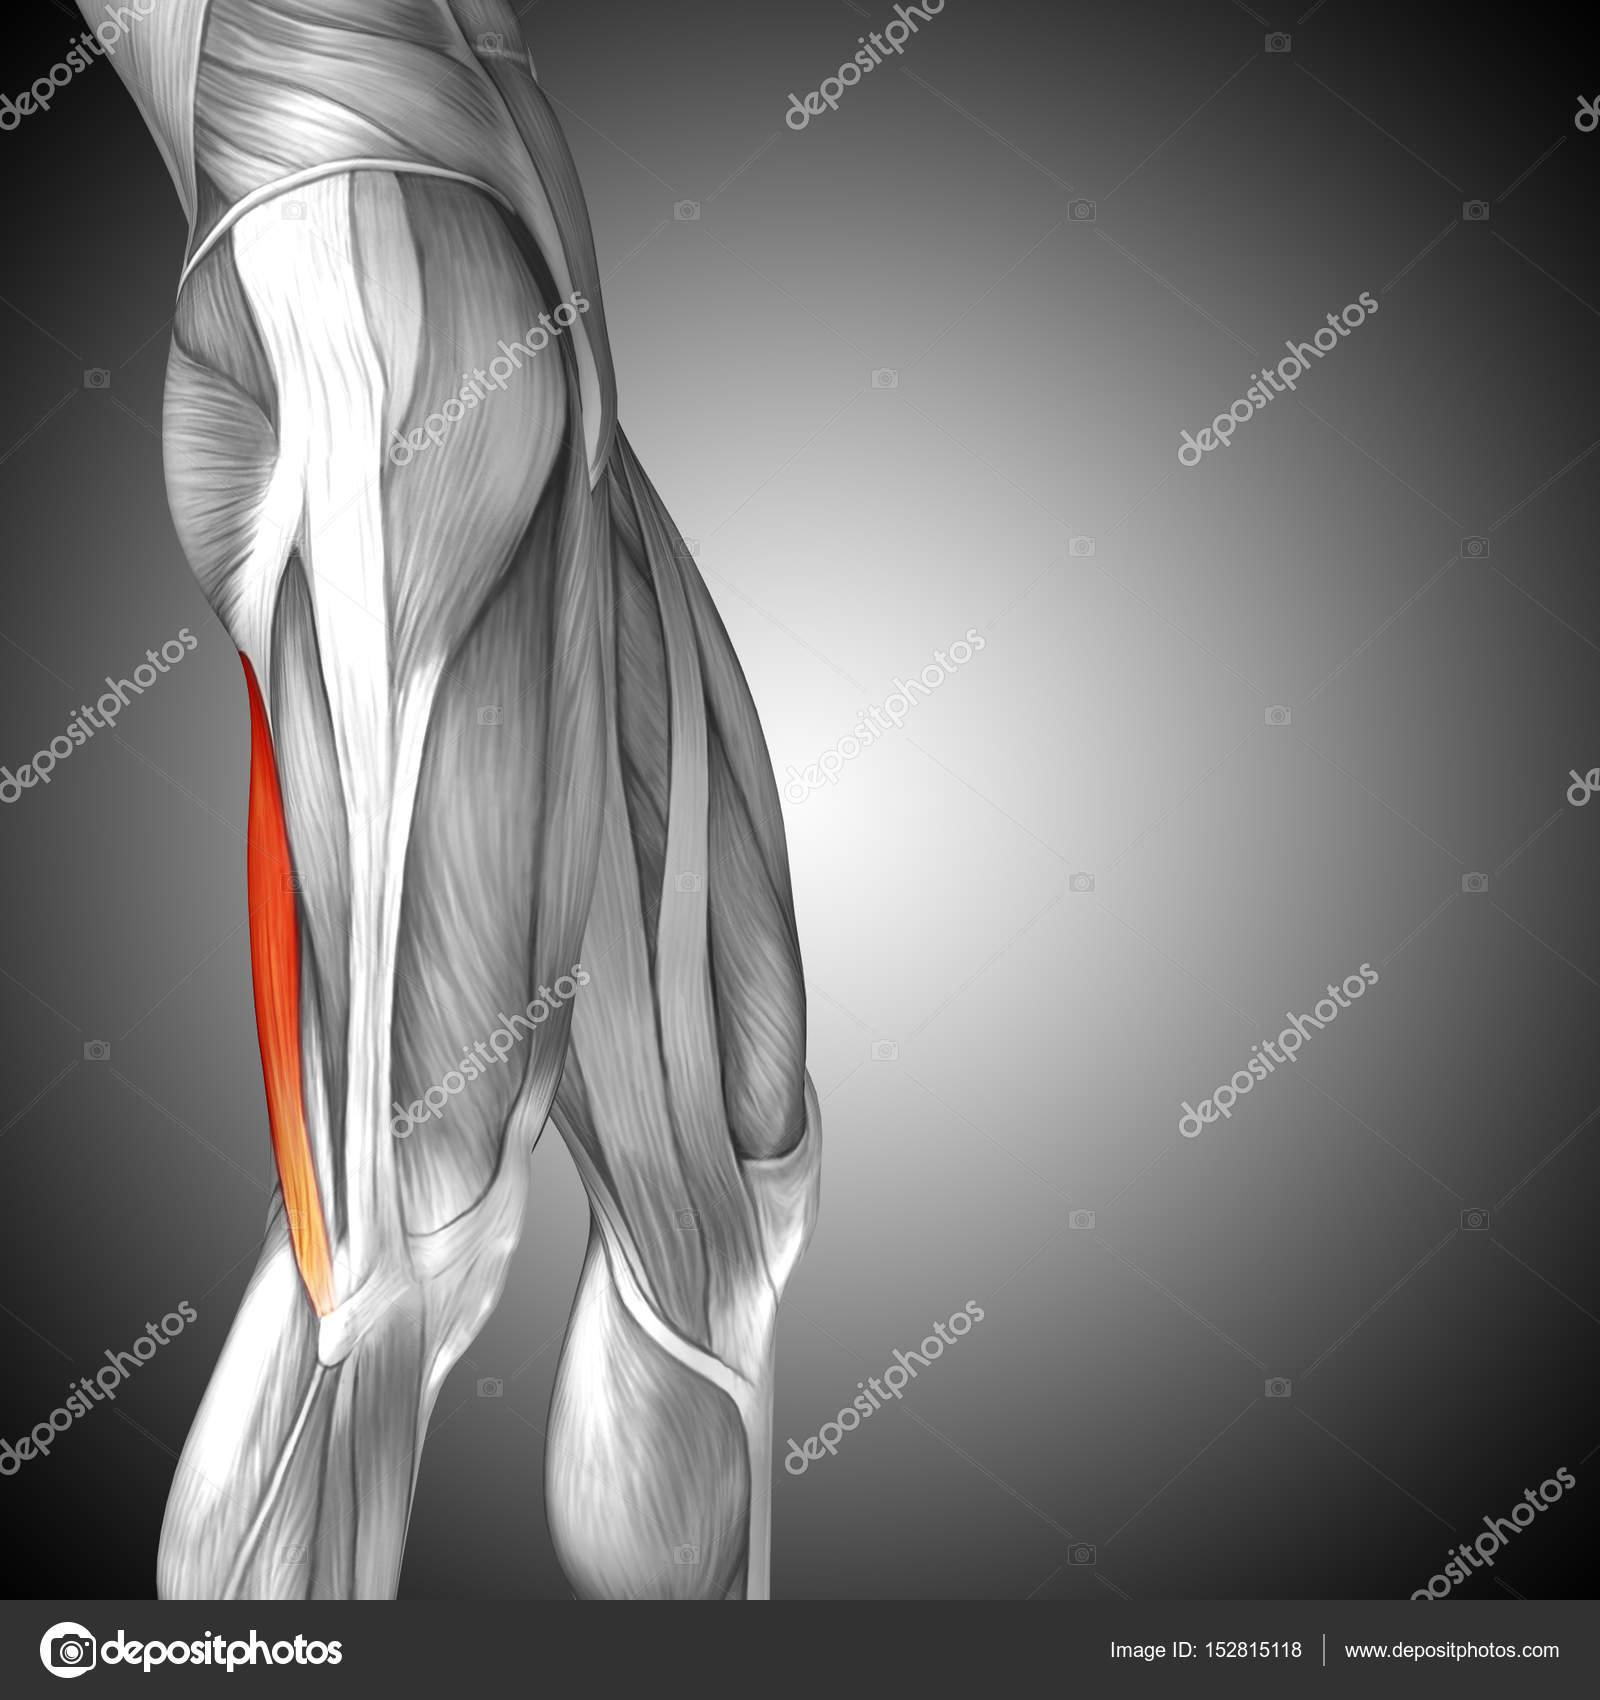 anatomía humana piernas superiores — Foto de stock © design36 #152815118